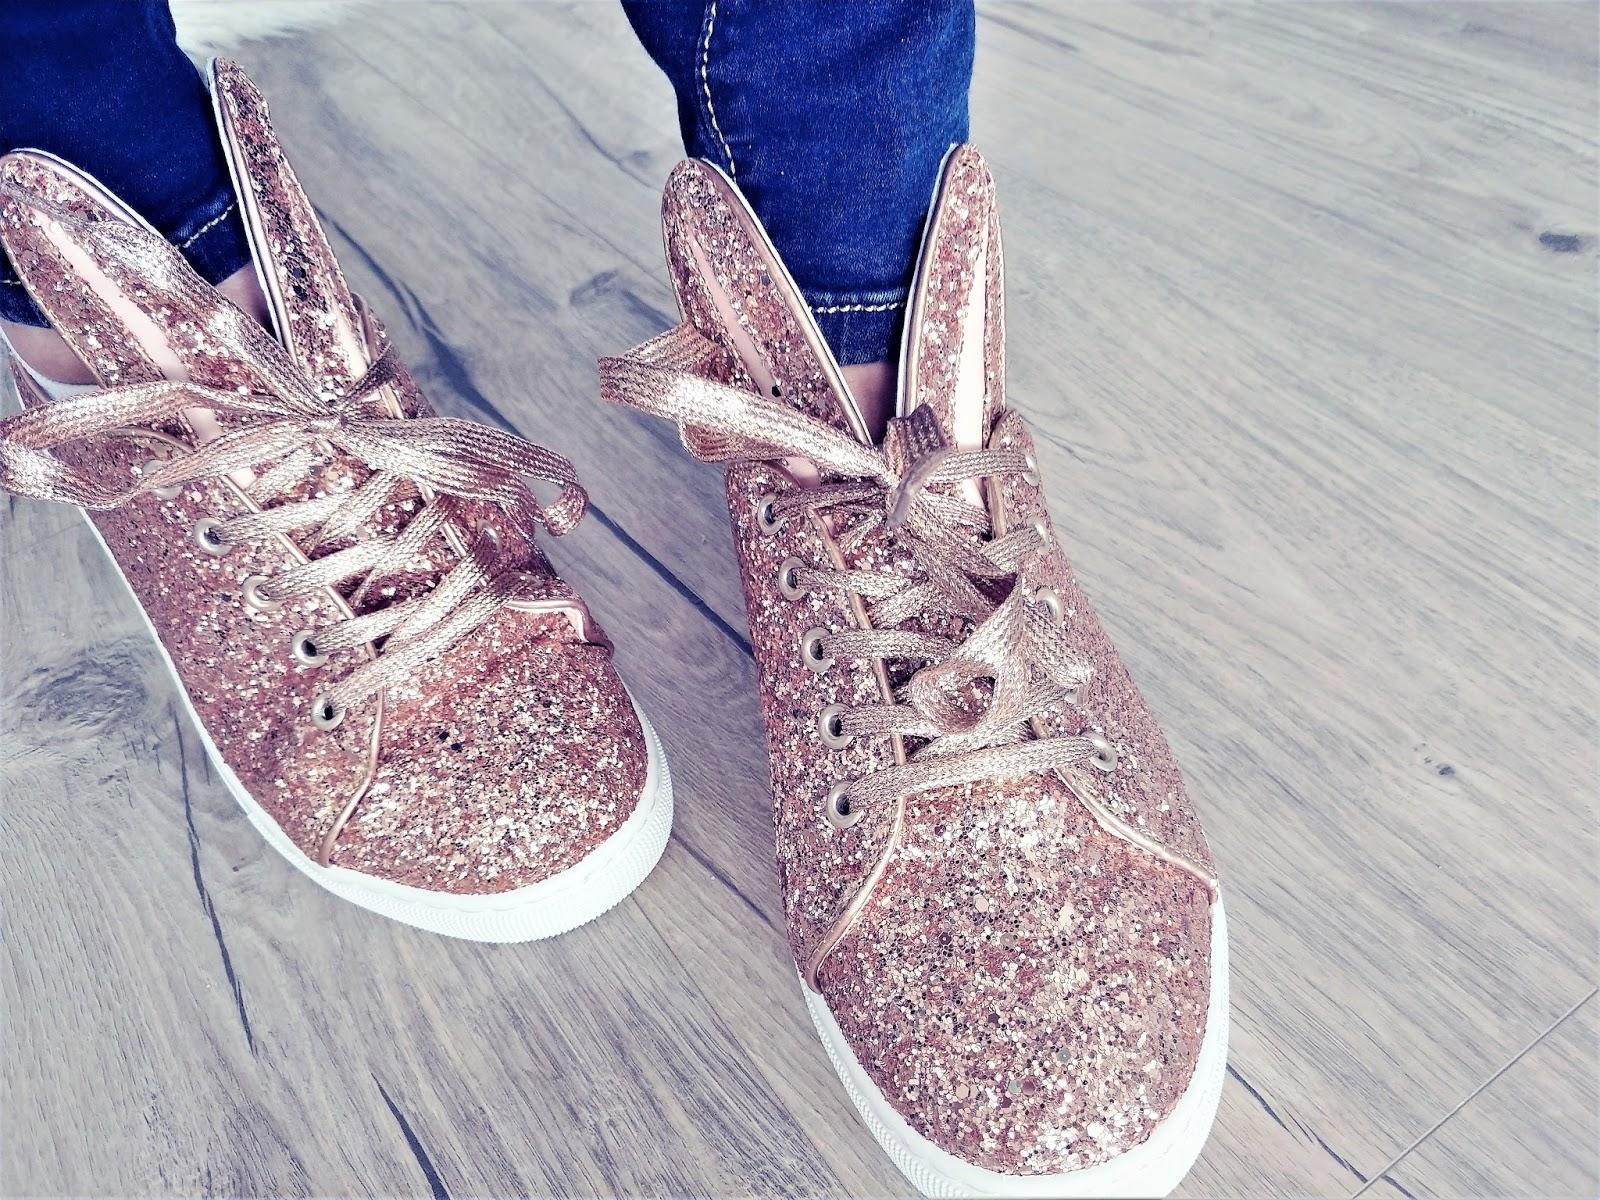 Yes, I'm a shoeaholic. No, I don't need help.